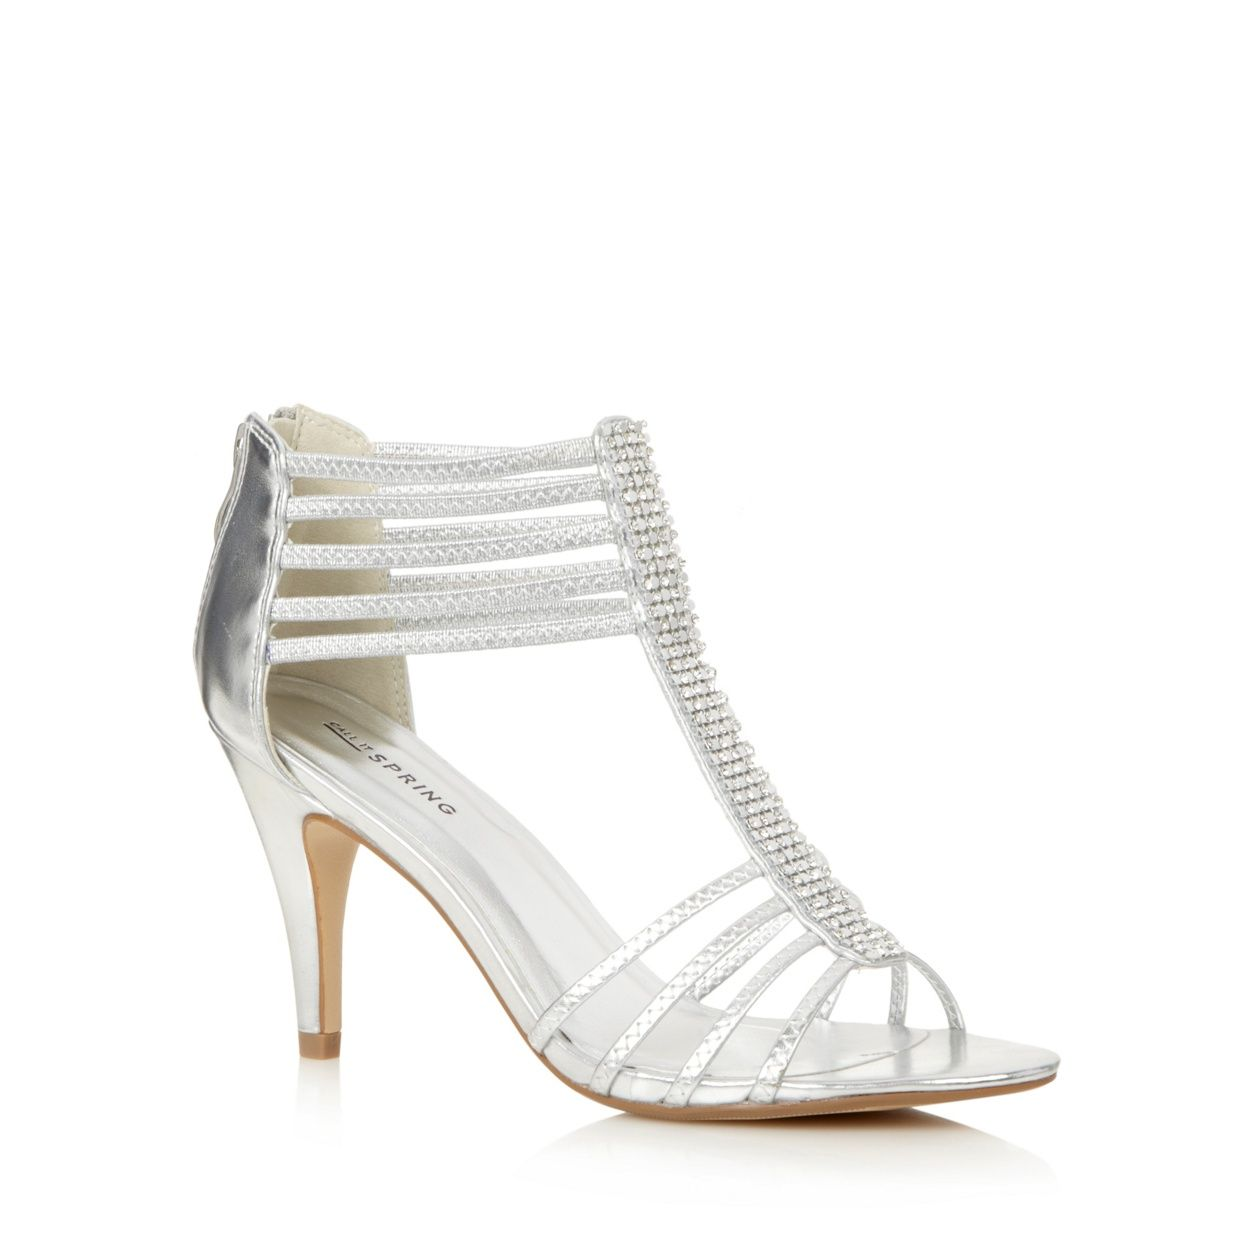 Women's sandals debenhams - Call It Spring Silver Handlesman Strap Heeled Sandals At Debenhams Com